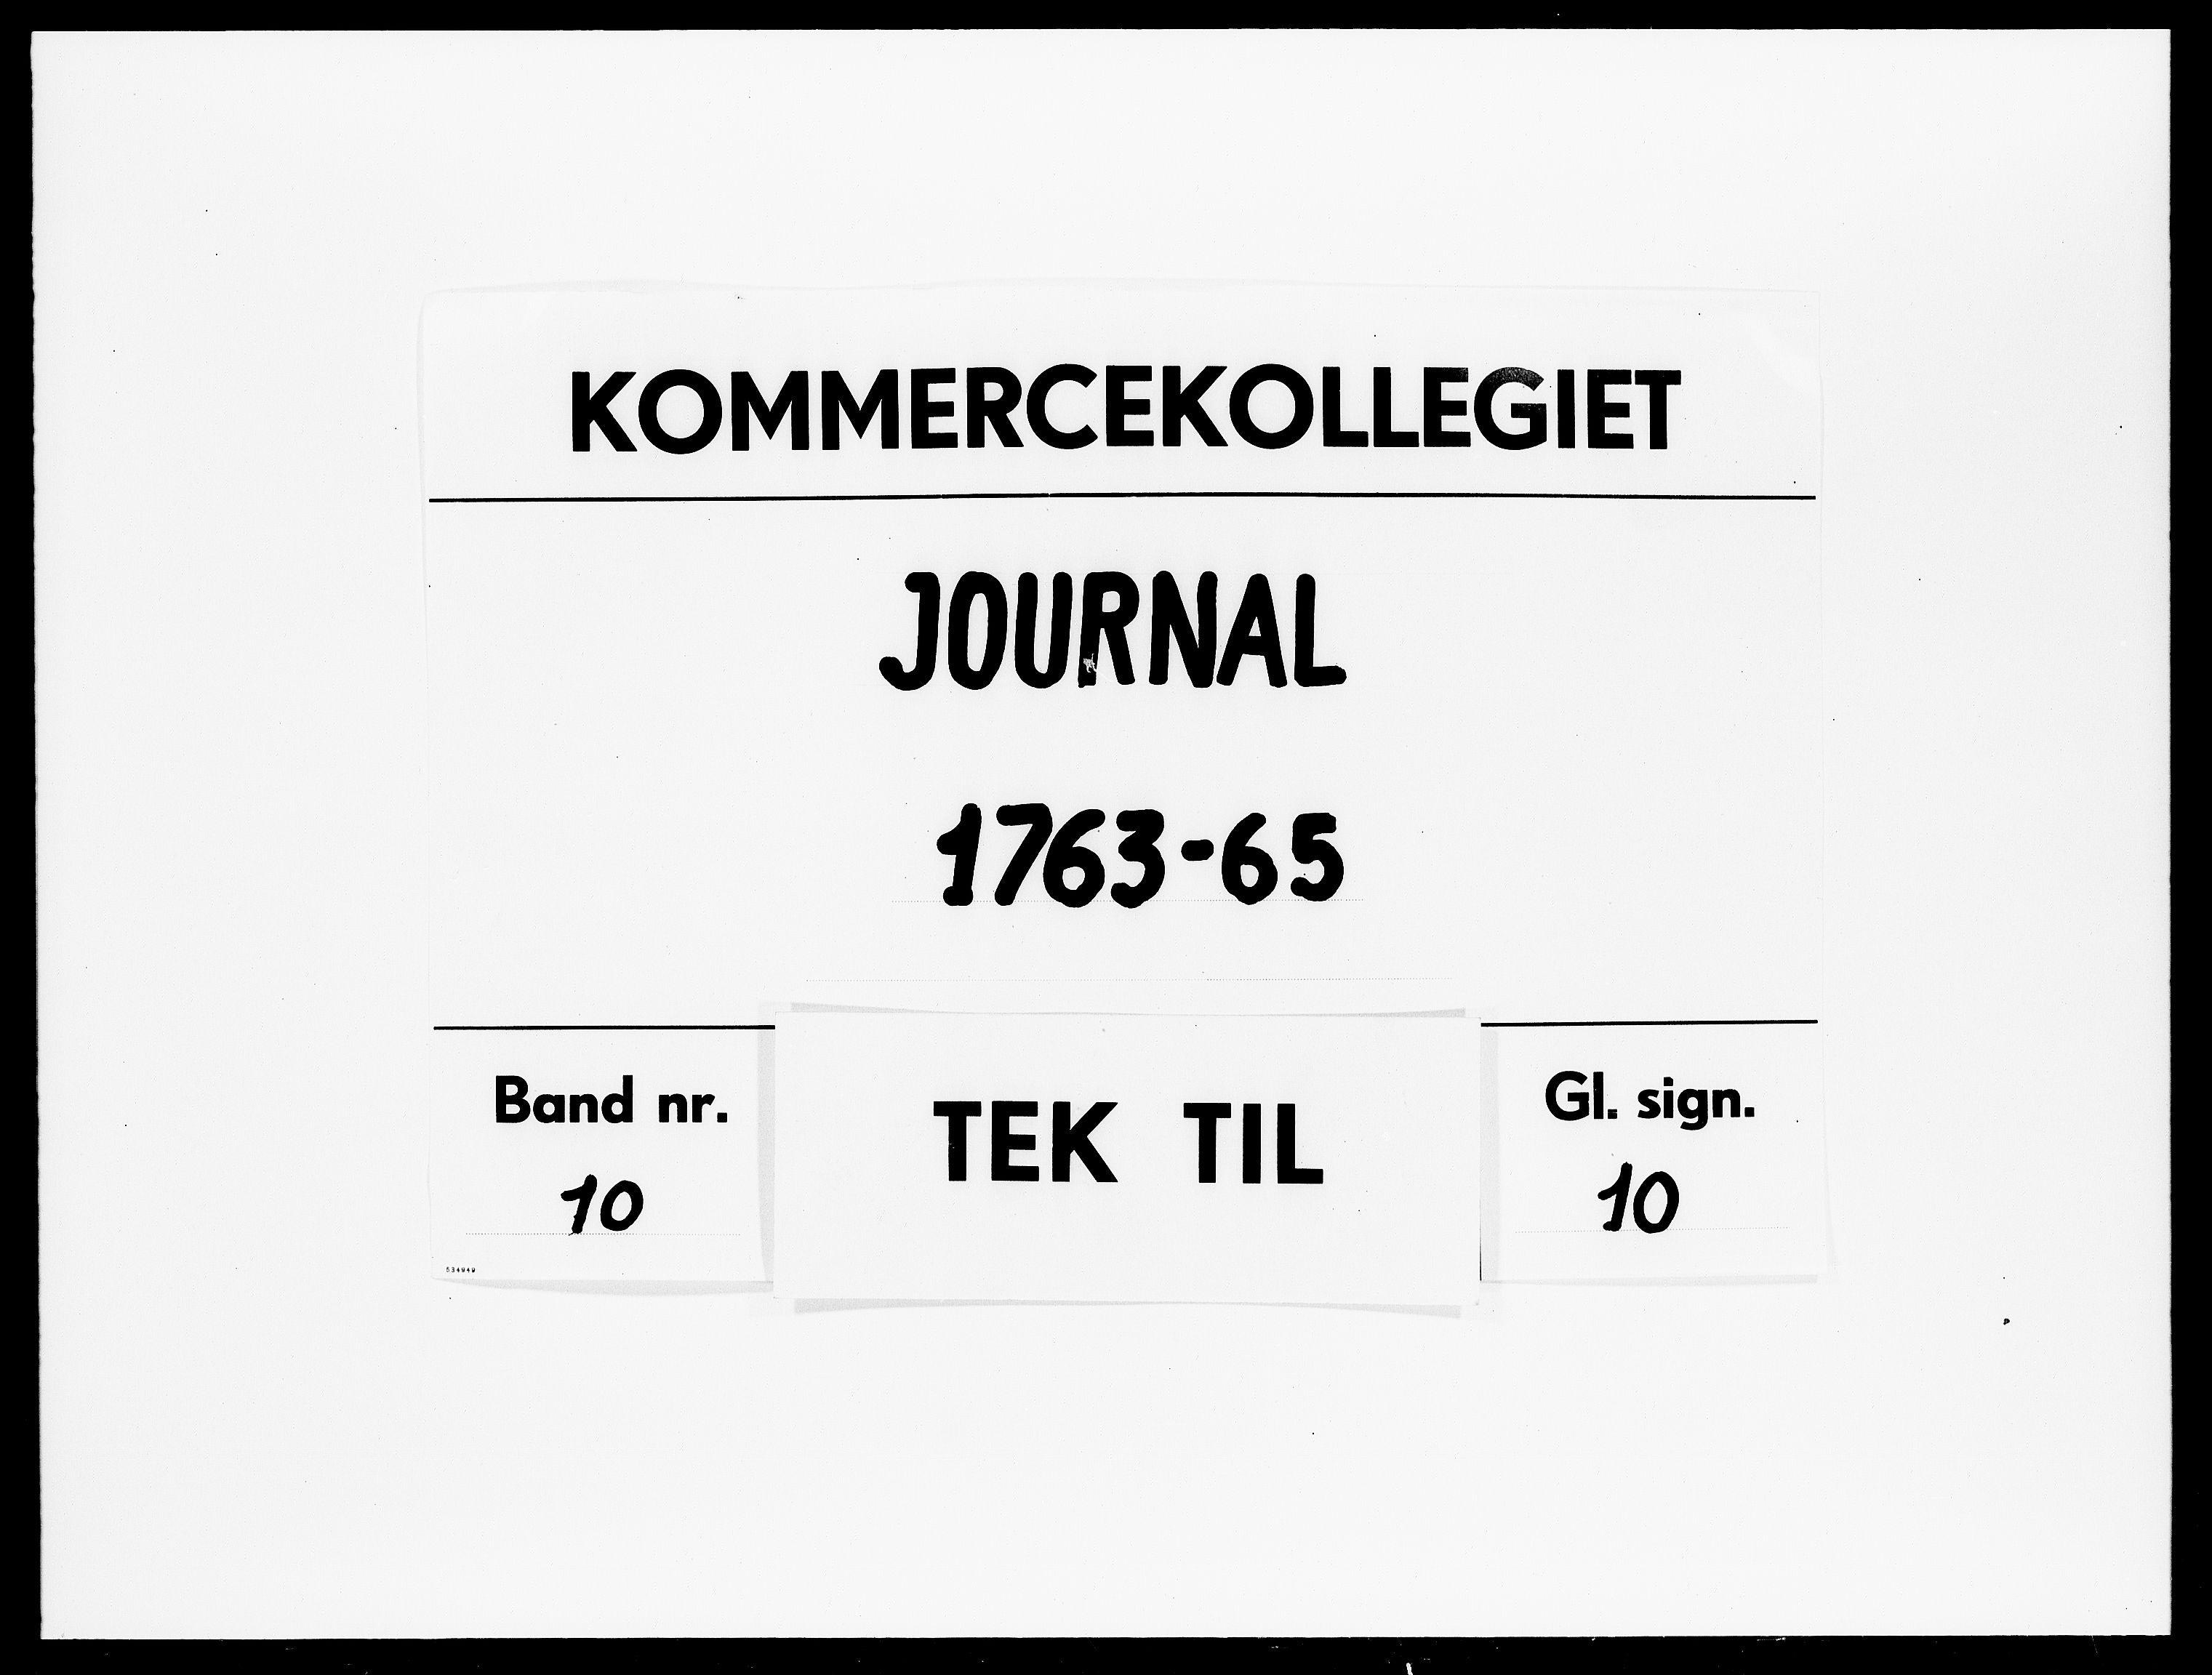 DRA, Kommercekollegiet, Dansk-Norske Sekretariat, -/58: Journal nr. 10, 1763-1765